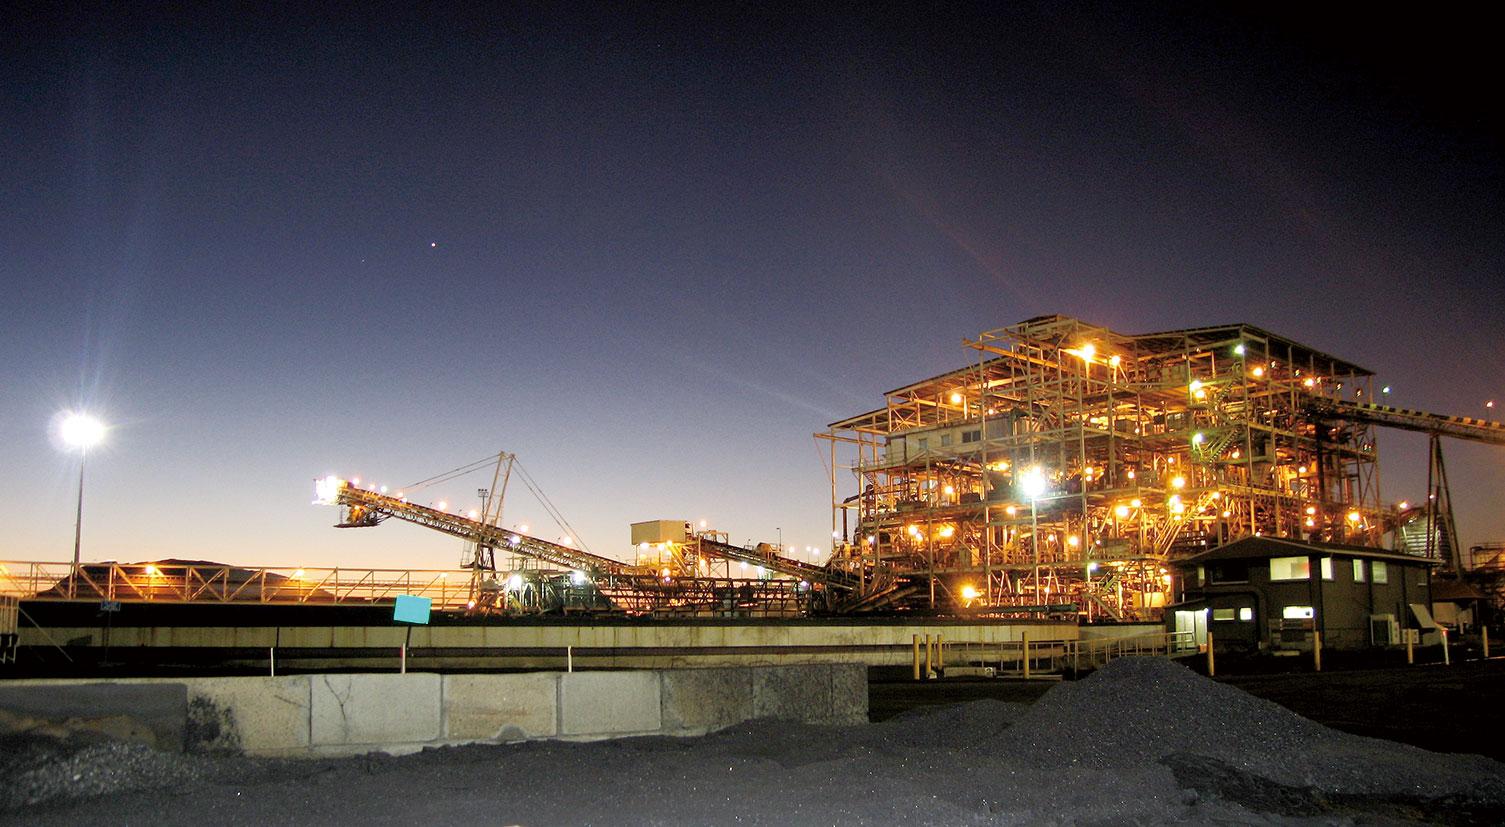 BMA、無人トラック9月投入 石炭事業初